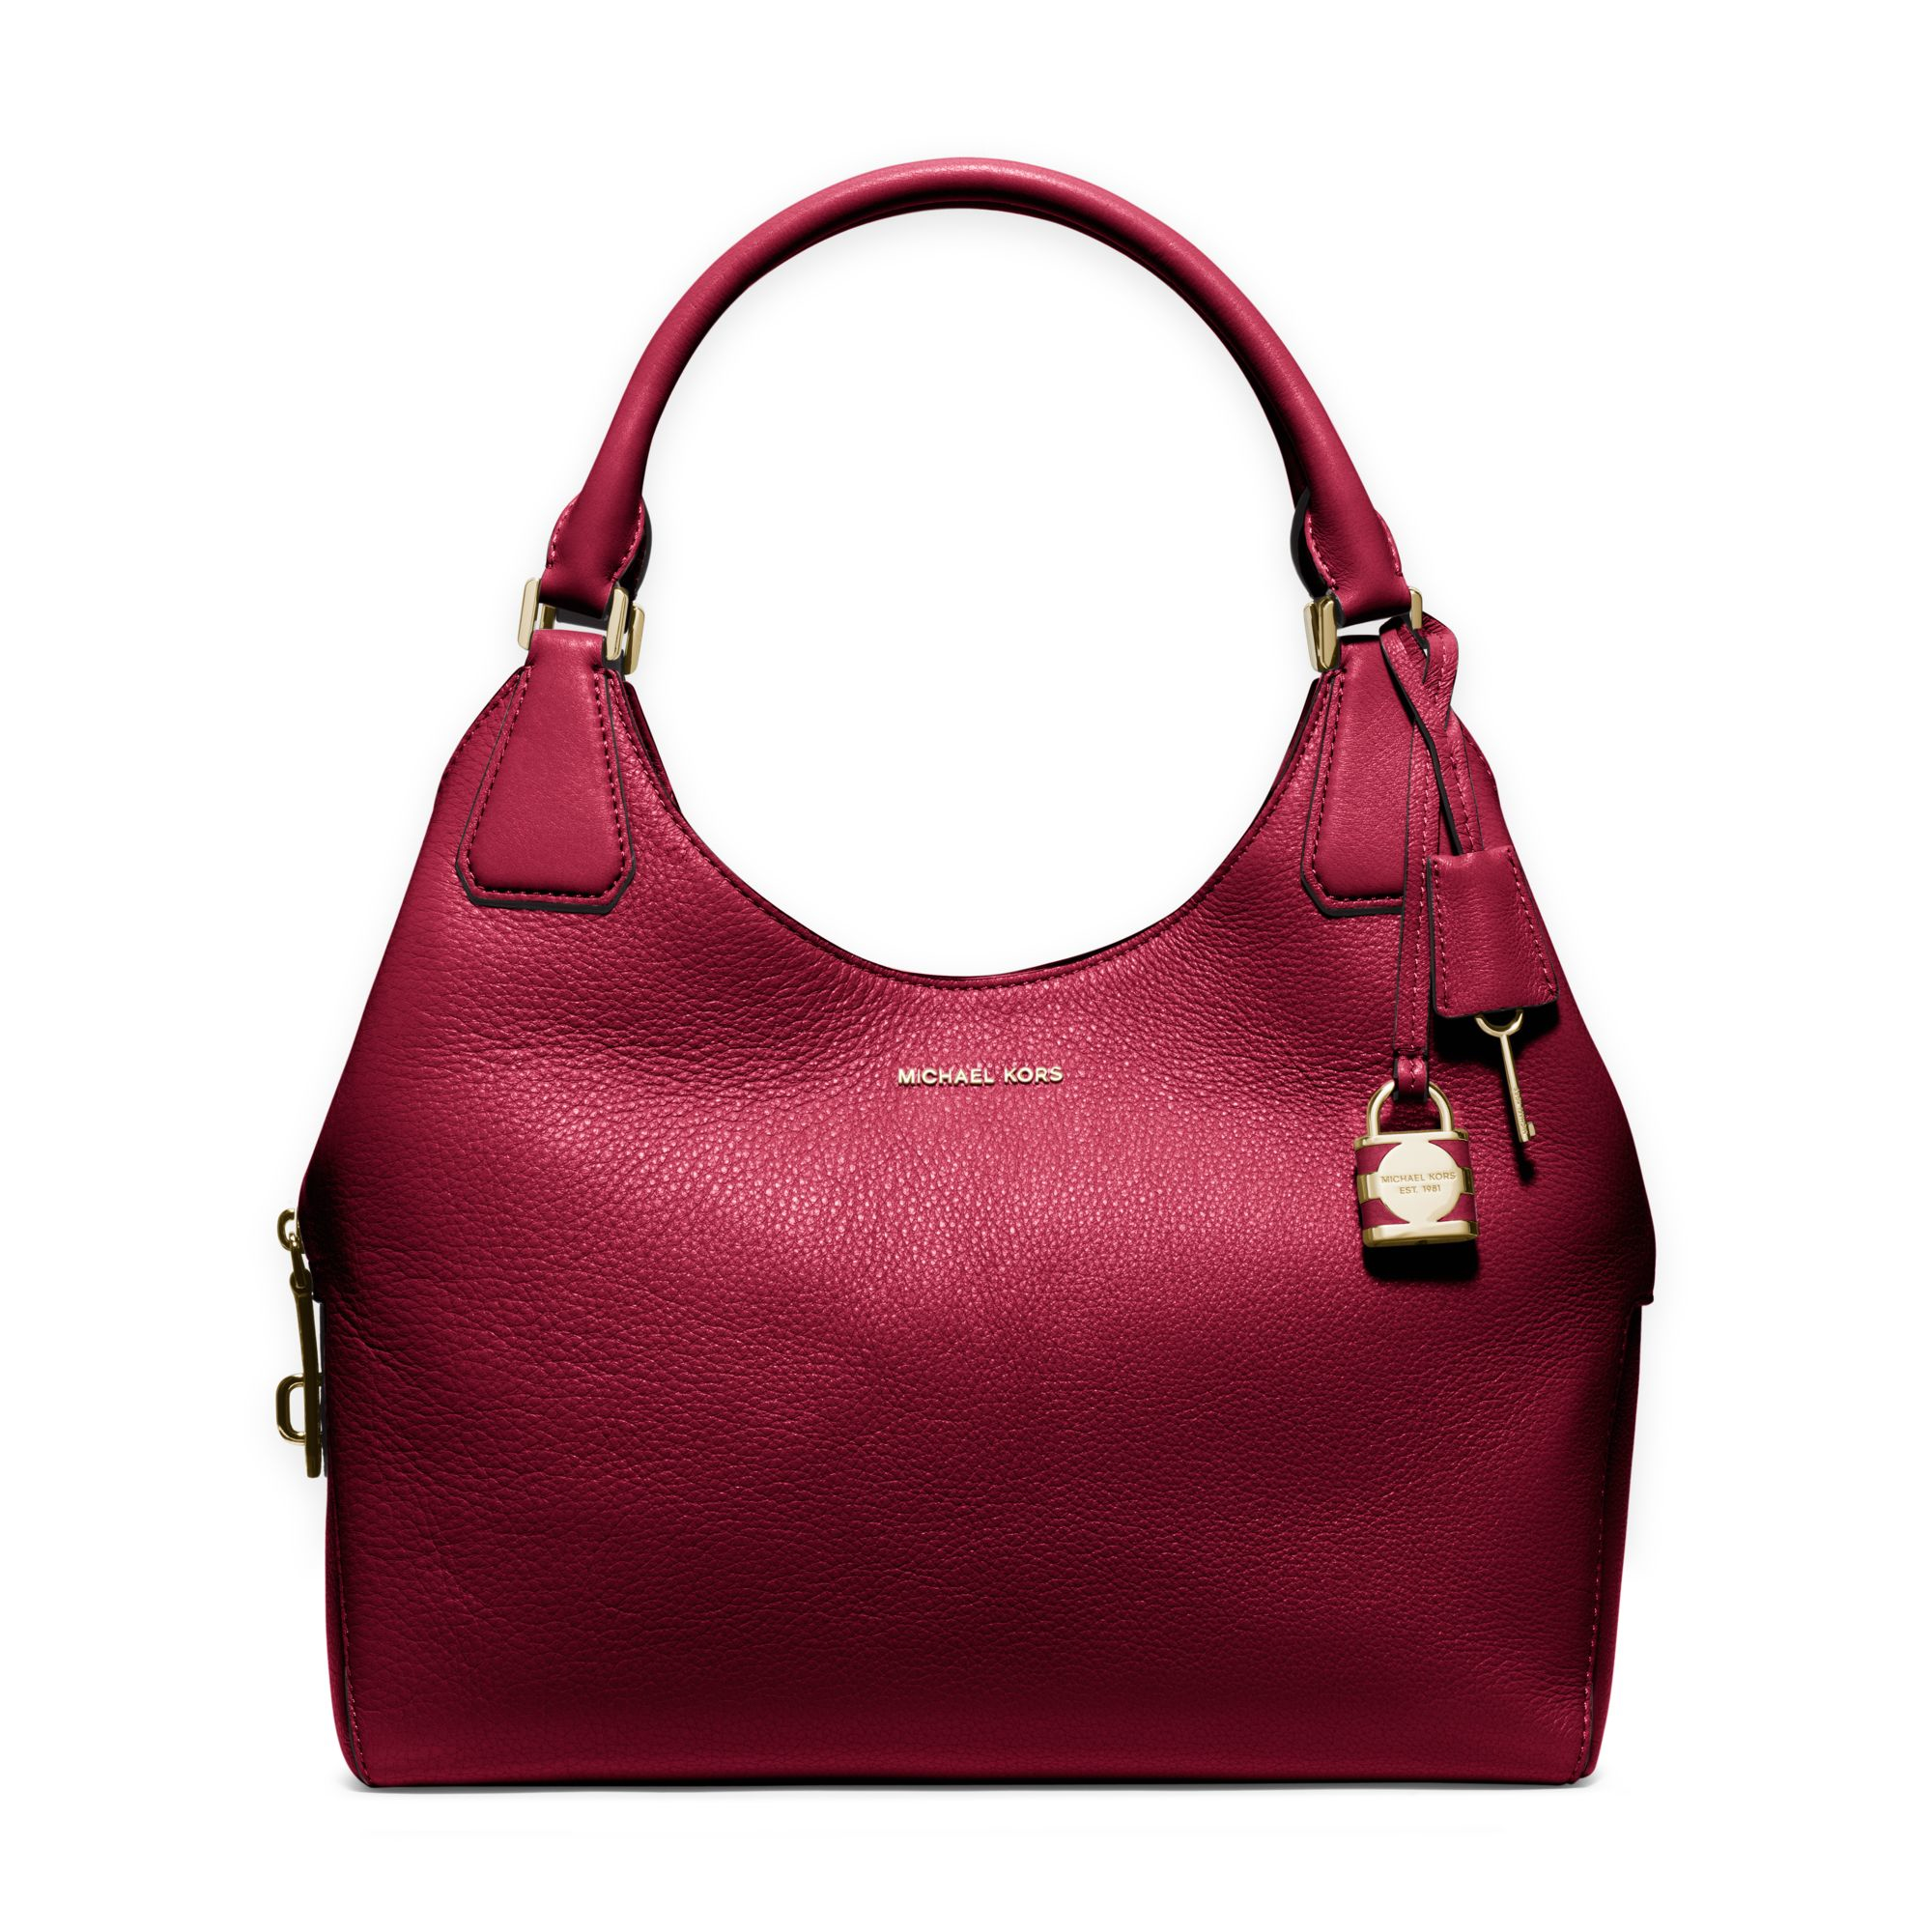 Michael kors Camille Large Leather Shoulder Bag in Red   Lyst